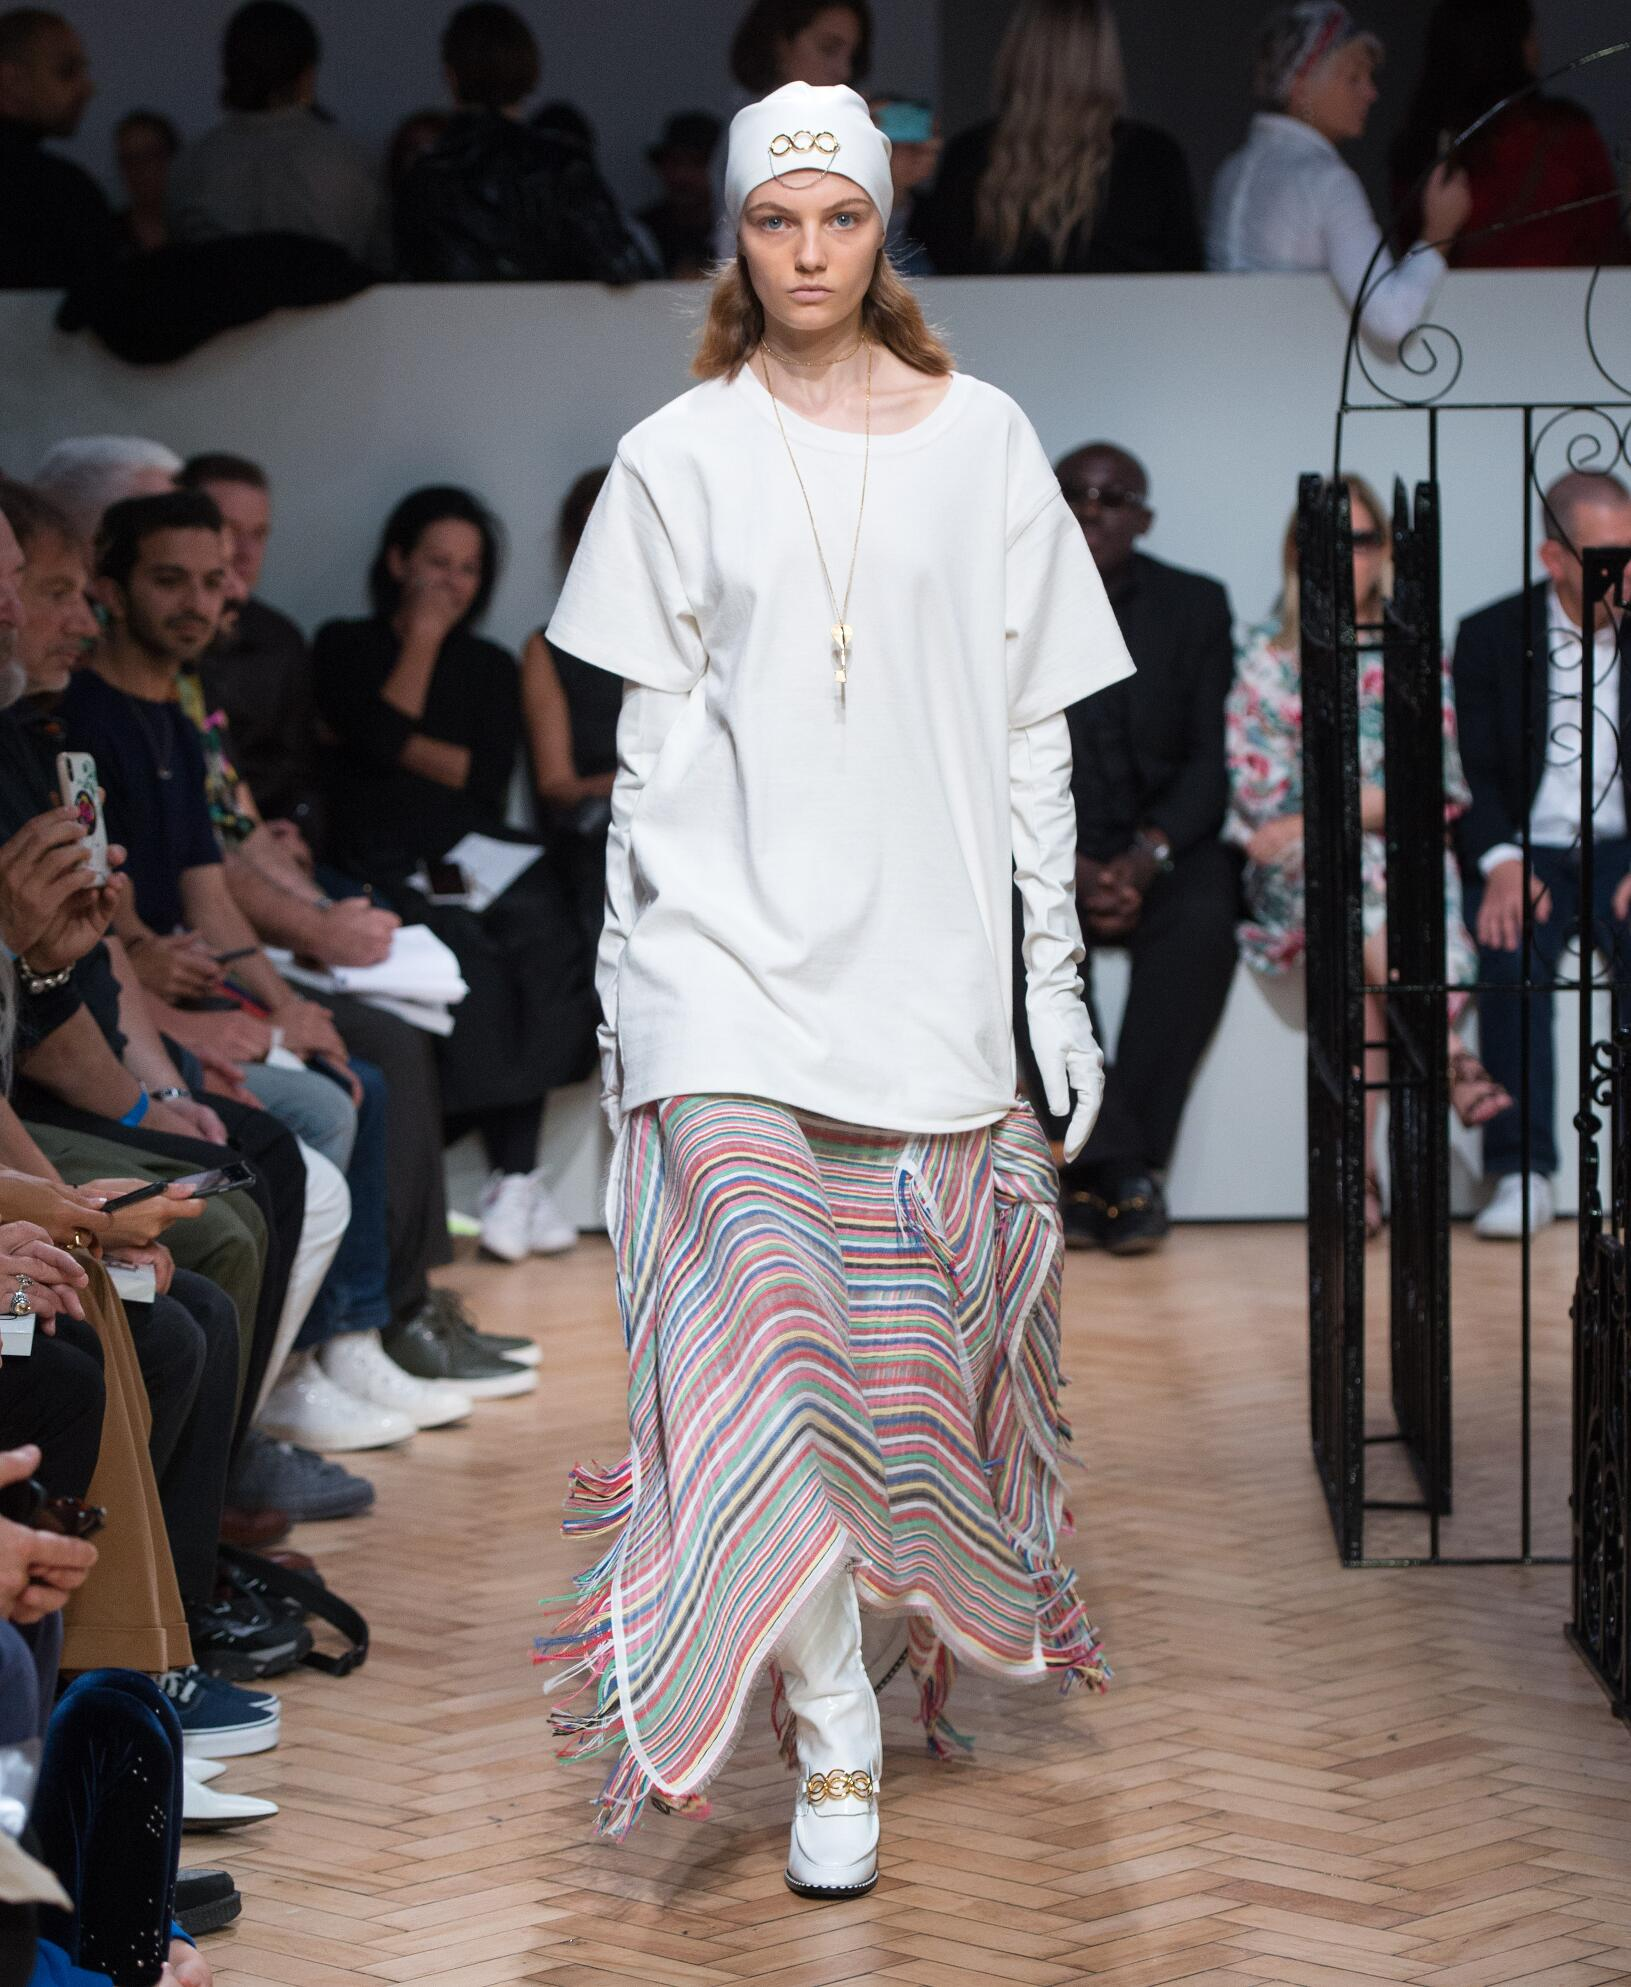 SS 2019 Fashion Show J.W. Anderson